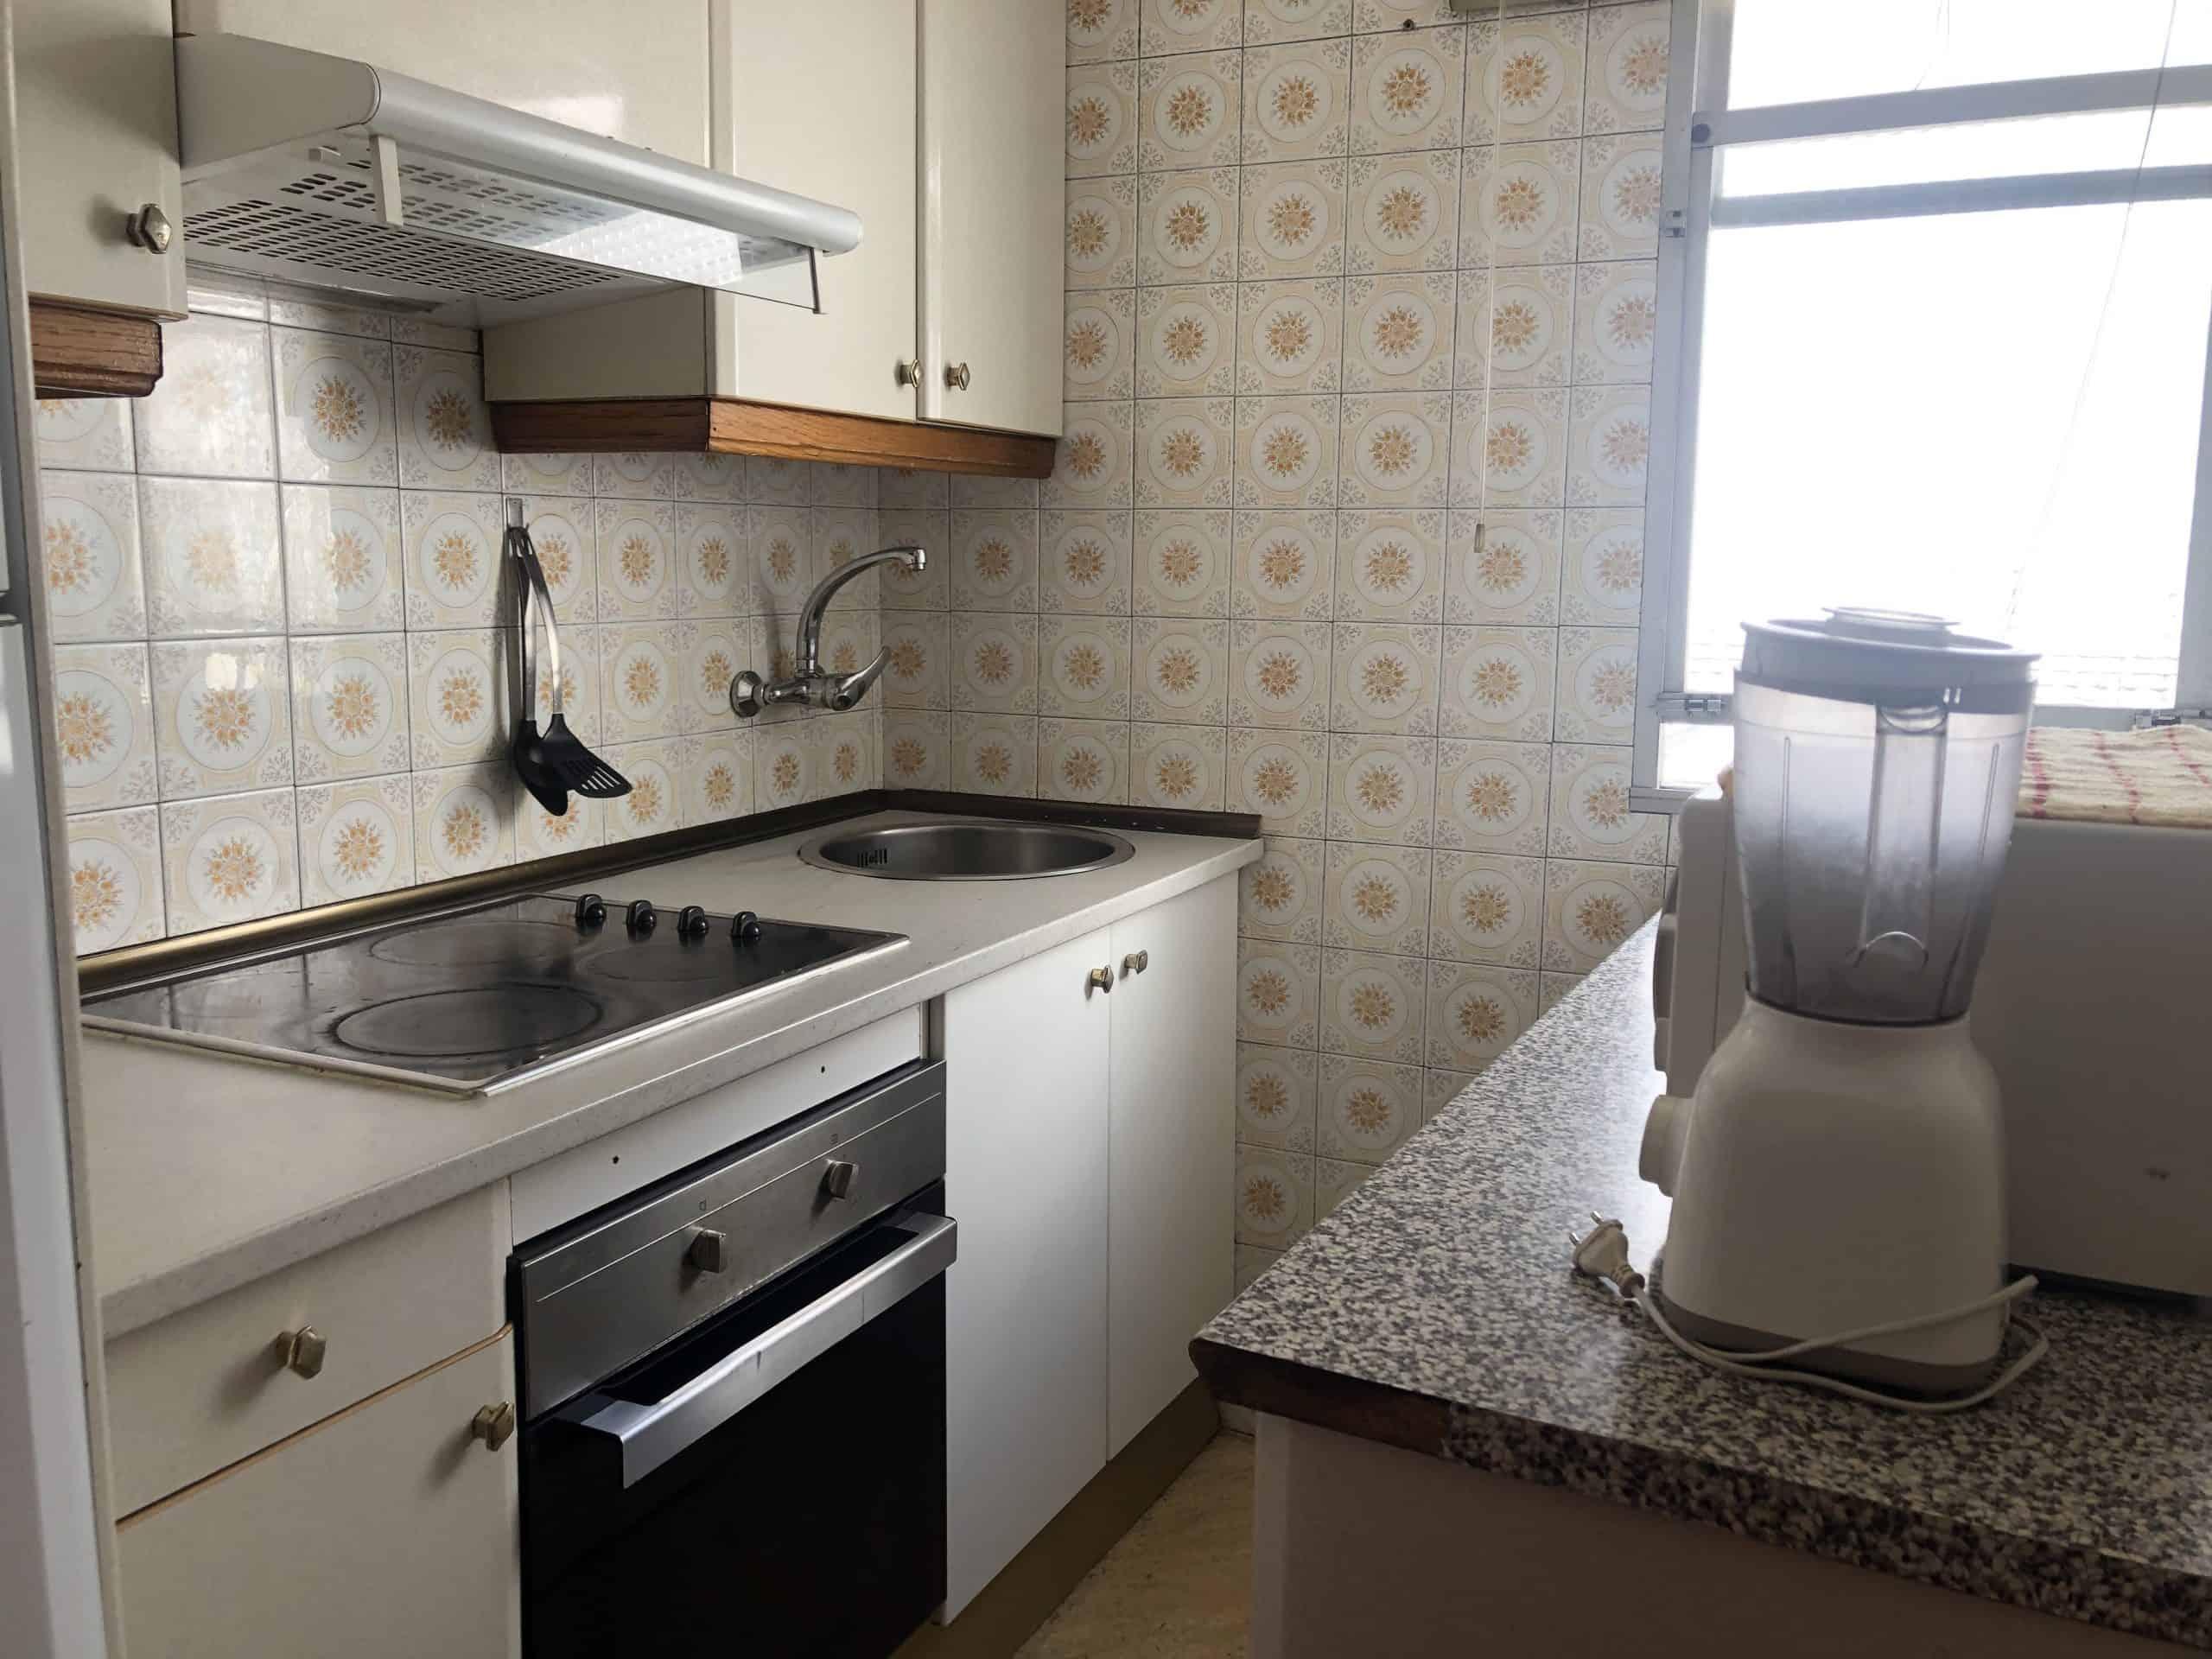 Agencia Inmobiliaria de Madrid-FUTUROCASA-Zona ARGANZUELA-EMBAJADORES-LEGAZPI -calle Embajadores- cocina